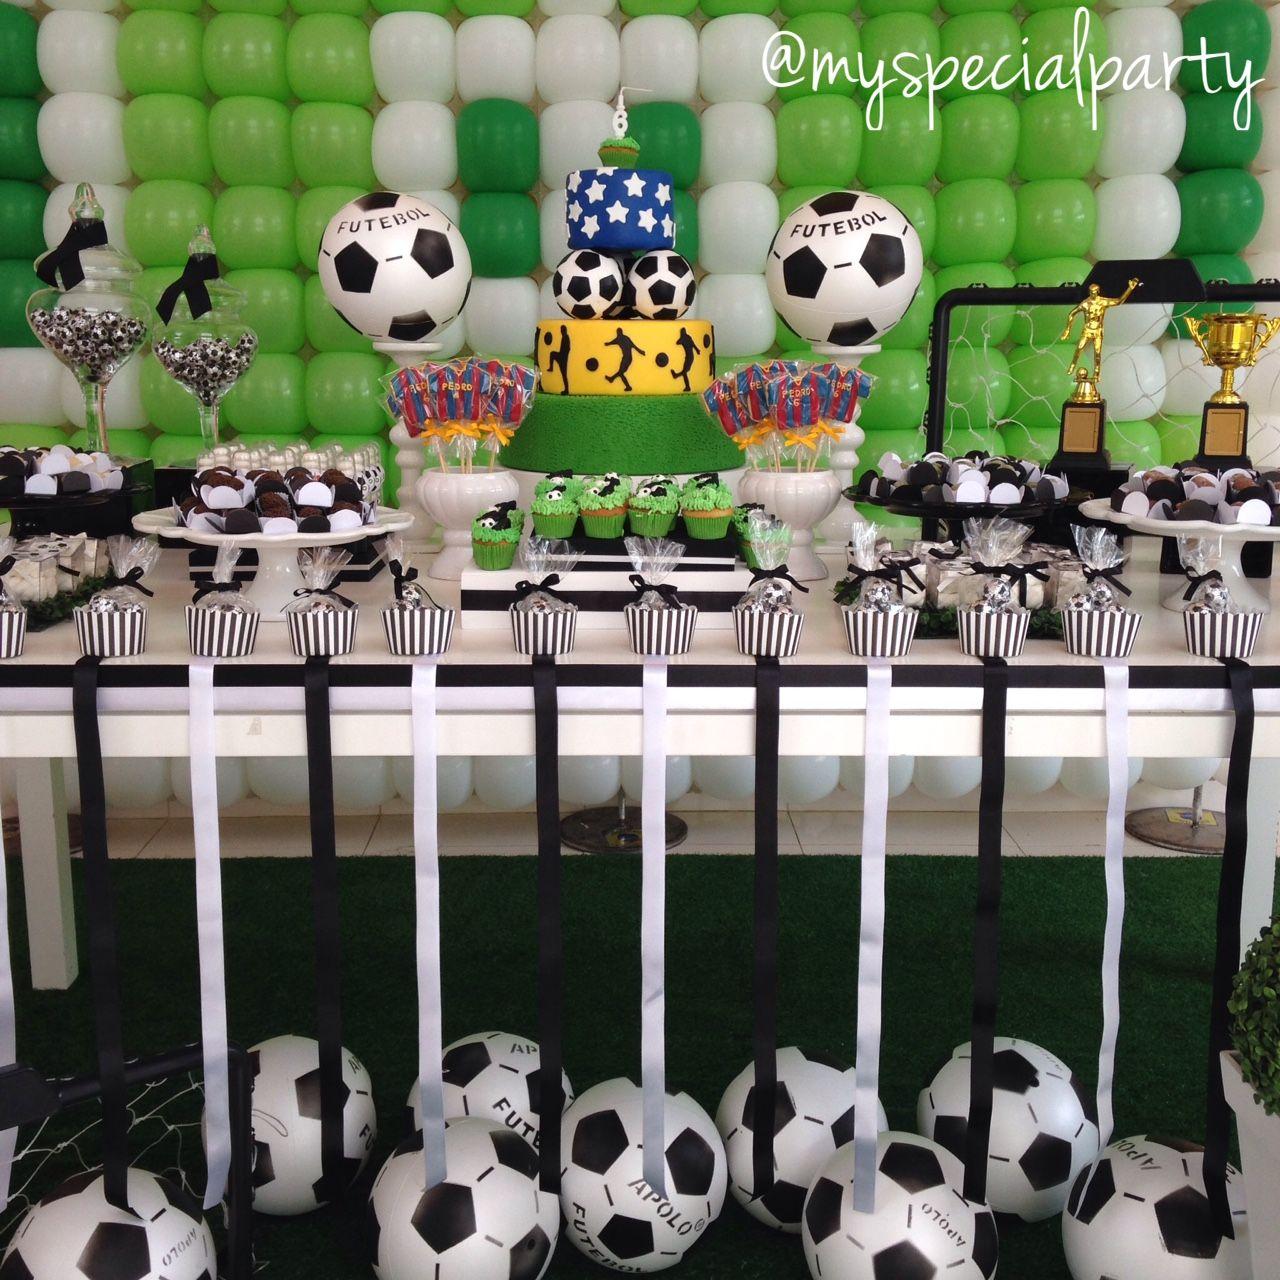 Decoracion de mesa de postres con pelotas de f tbol - Decoracion party ...